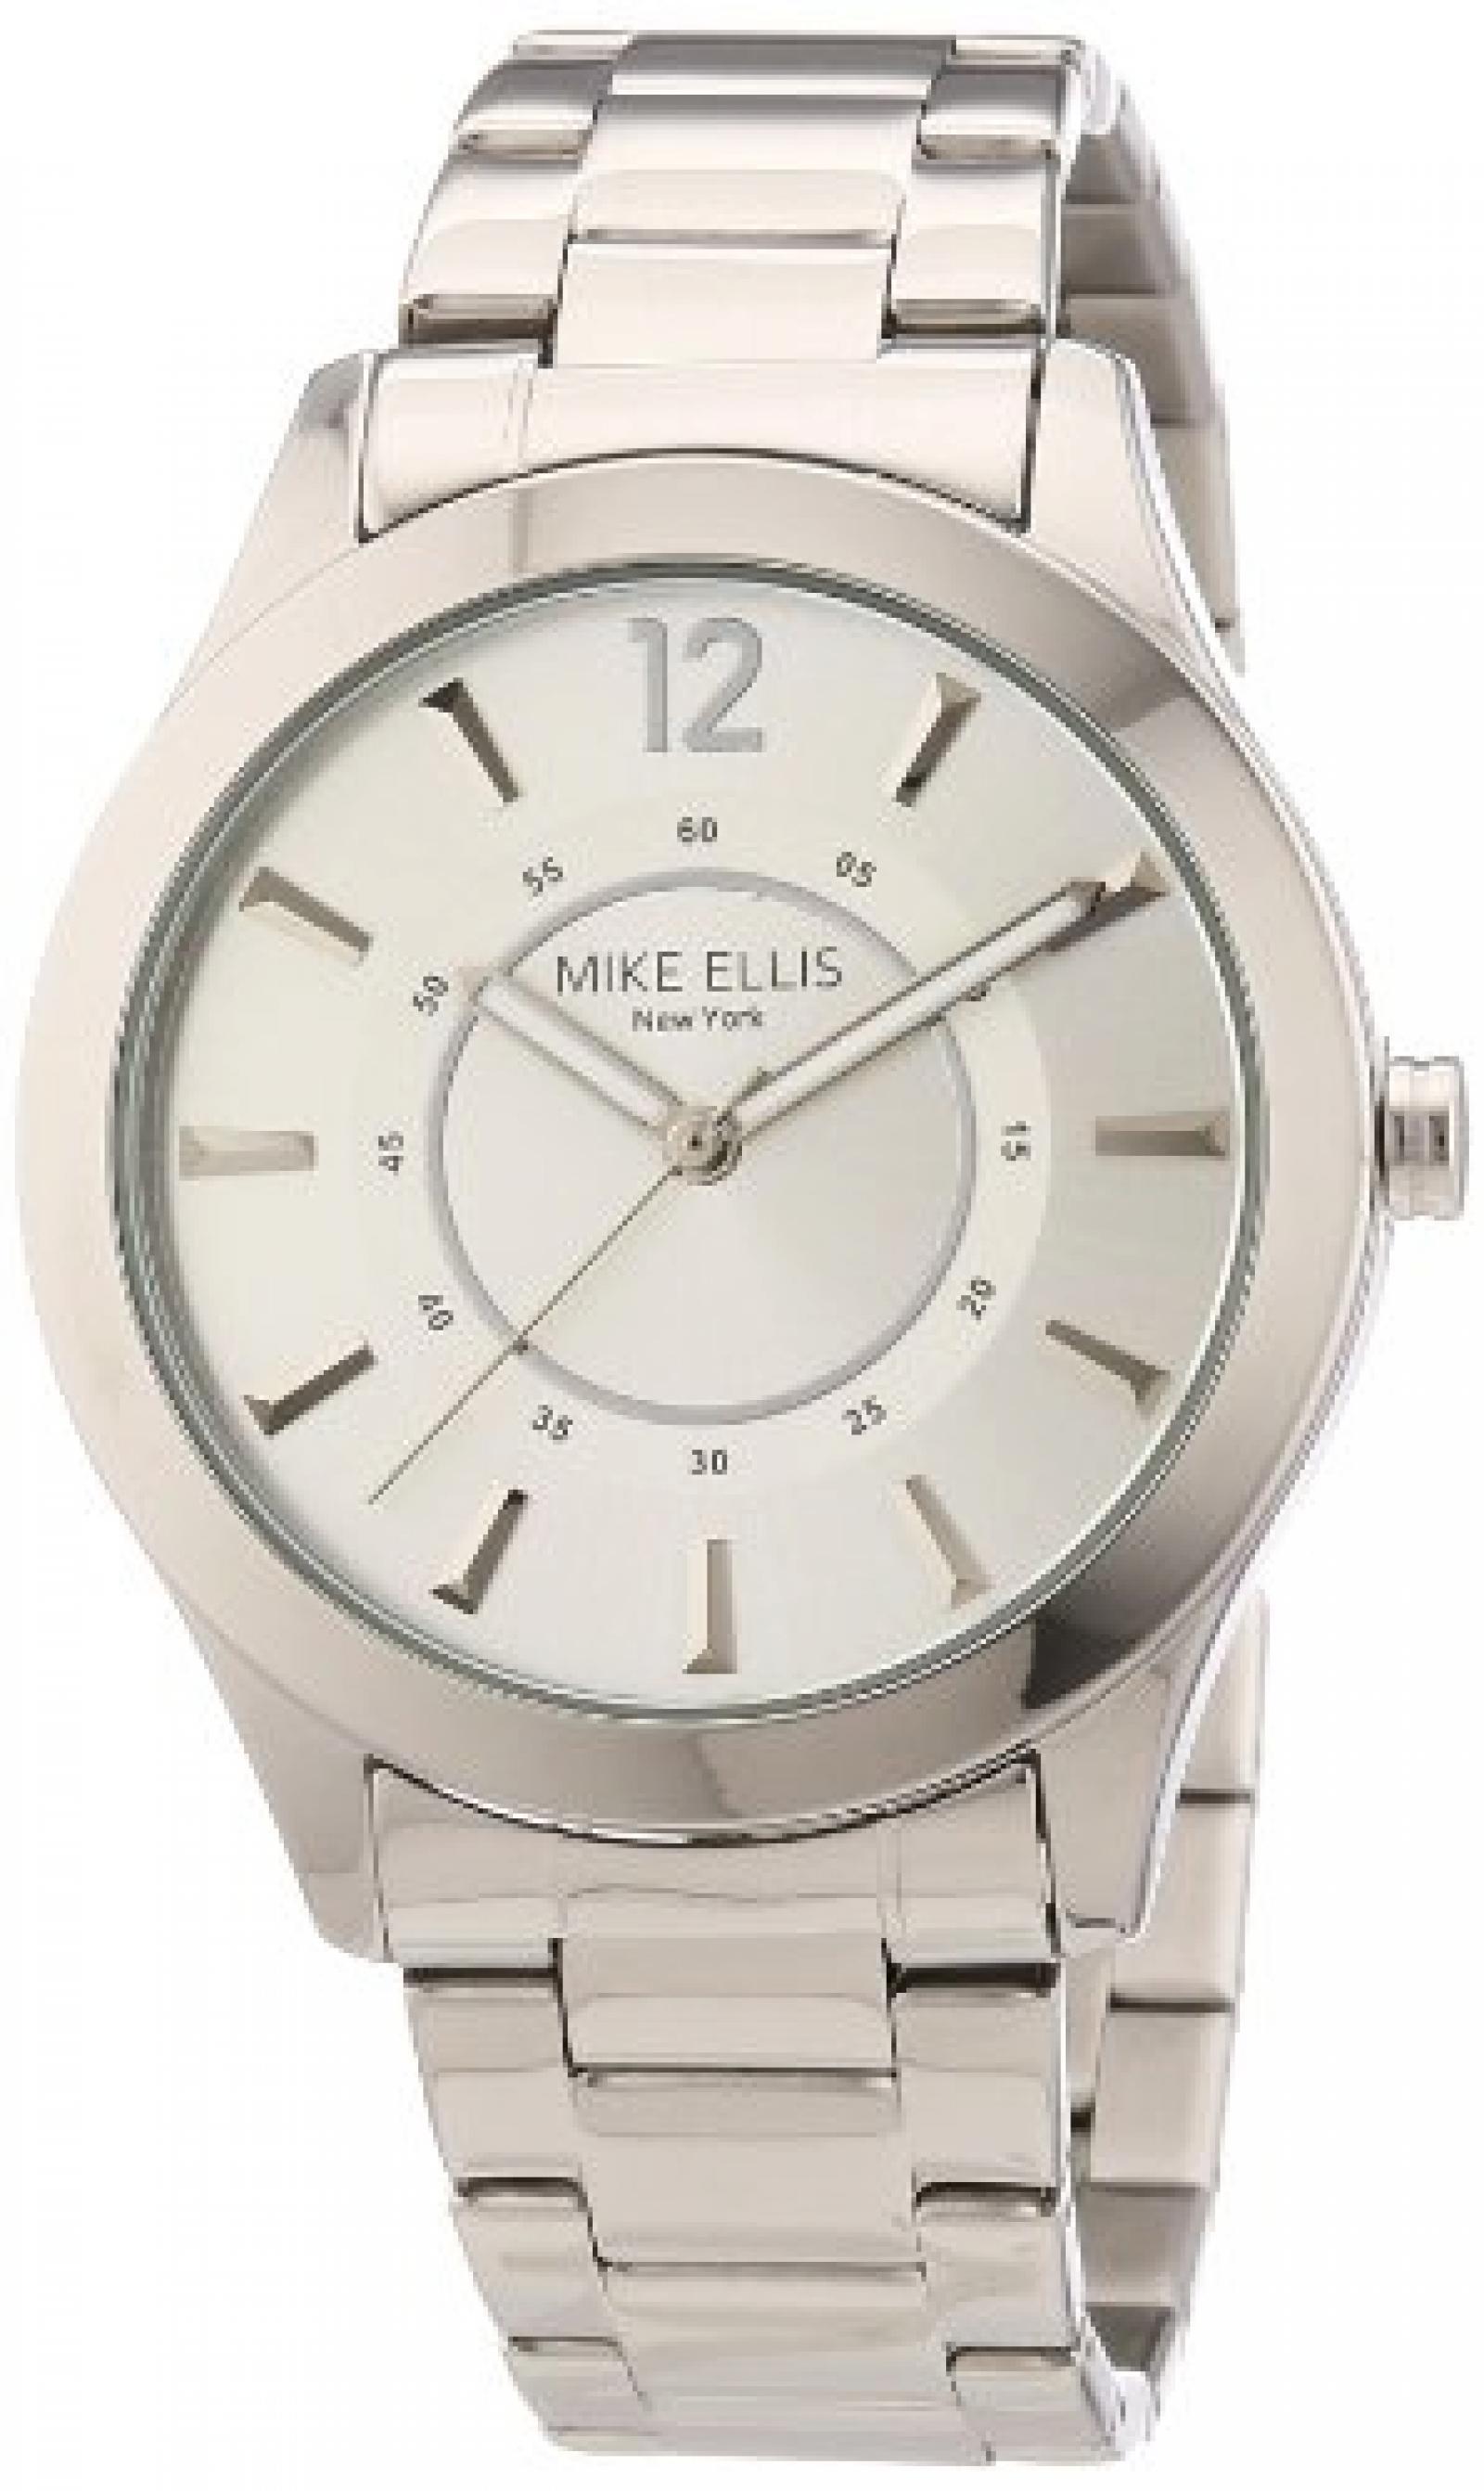 Mike Ellis New York Damen-Armbanduhr Analog Quarz Edelstahl M2756ASM